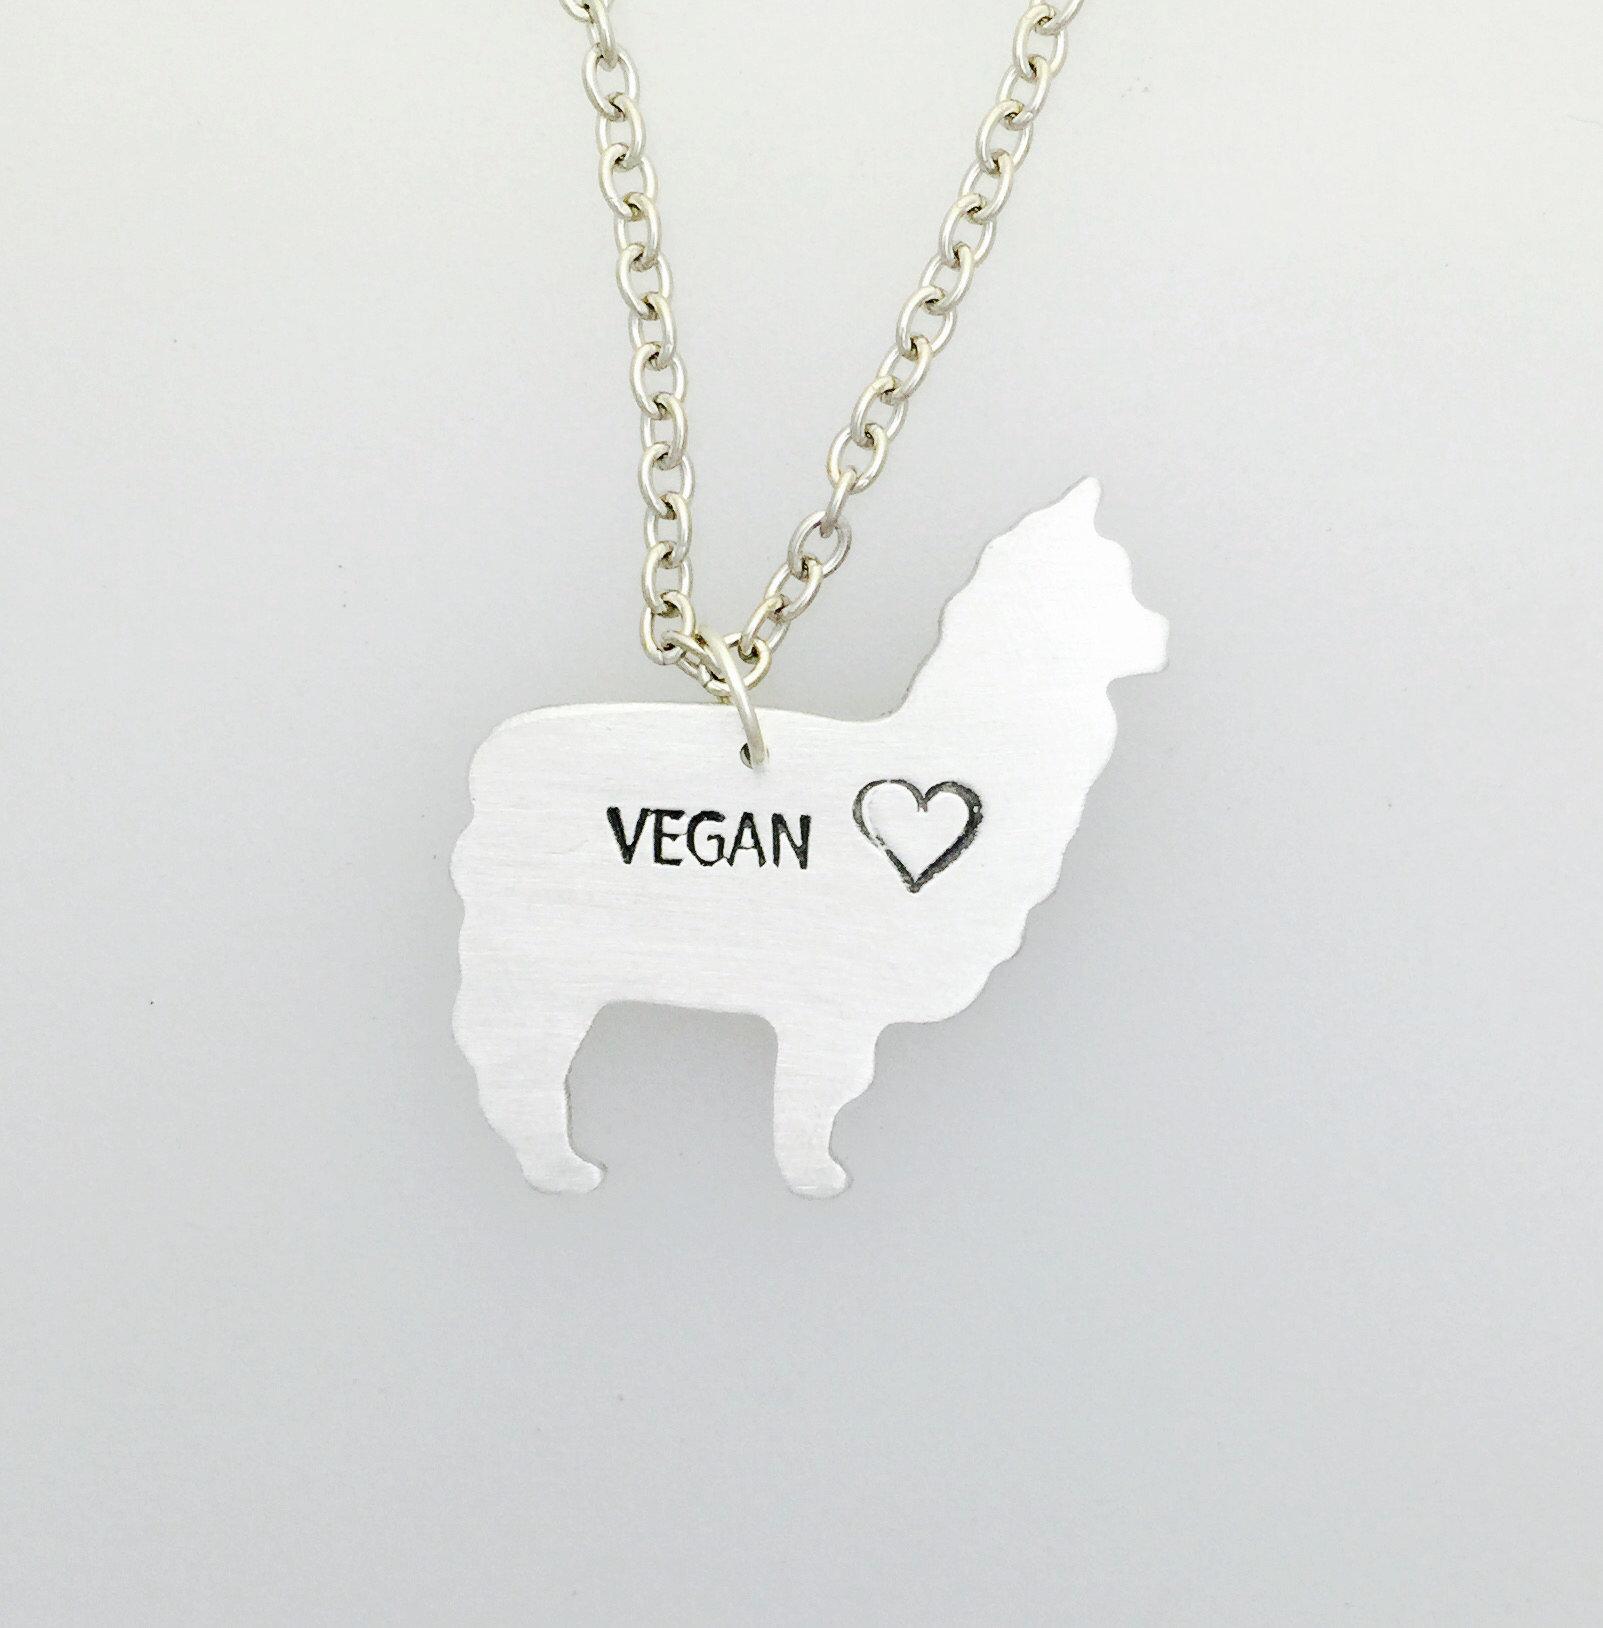 Vegan Llama Necklace Herbivore Llama Vegan Necklace Llama Vegan